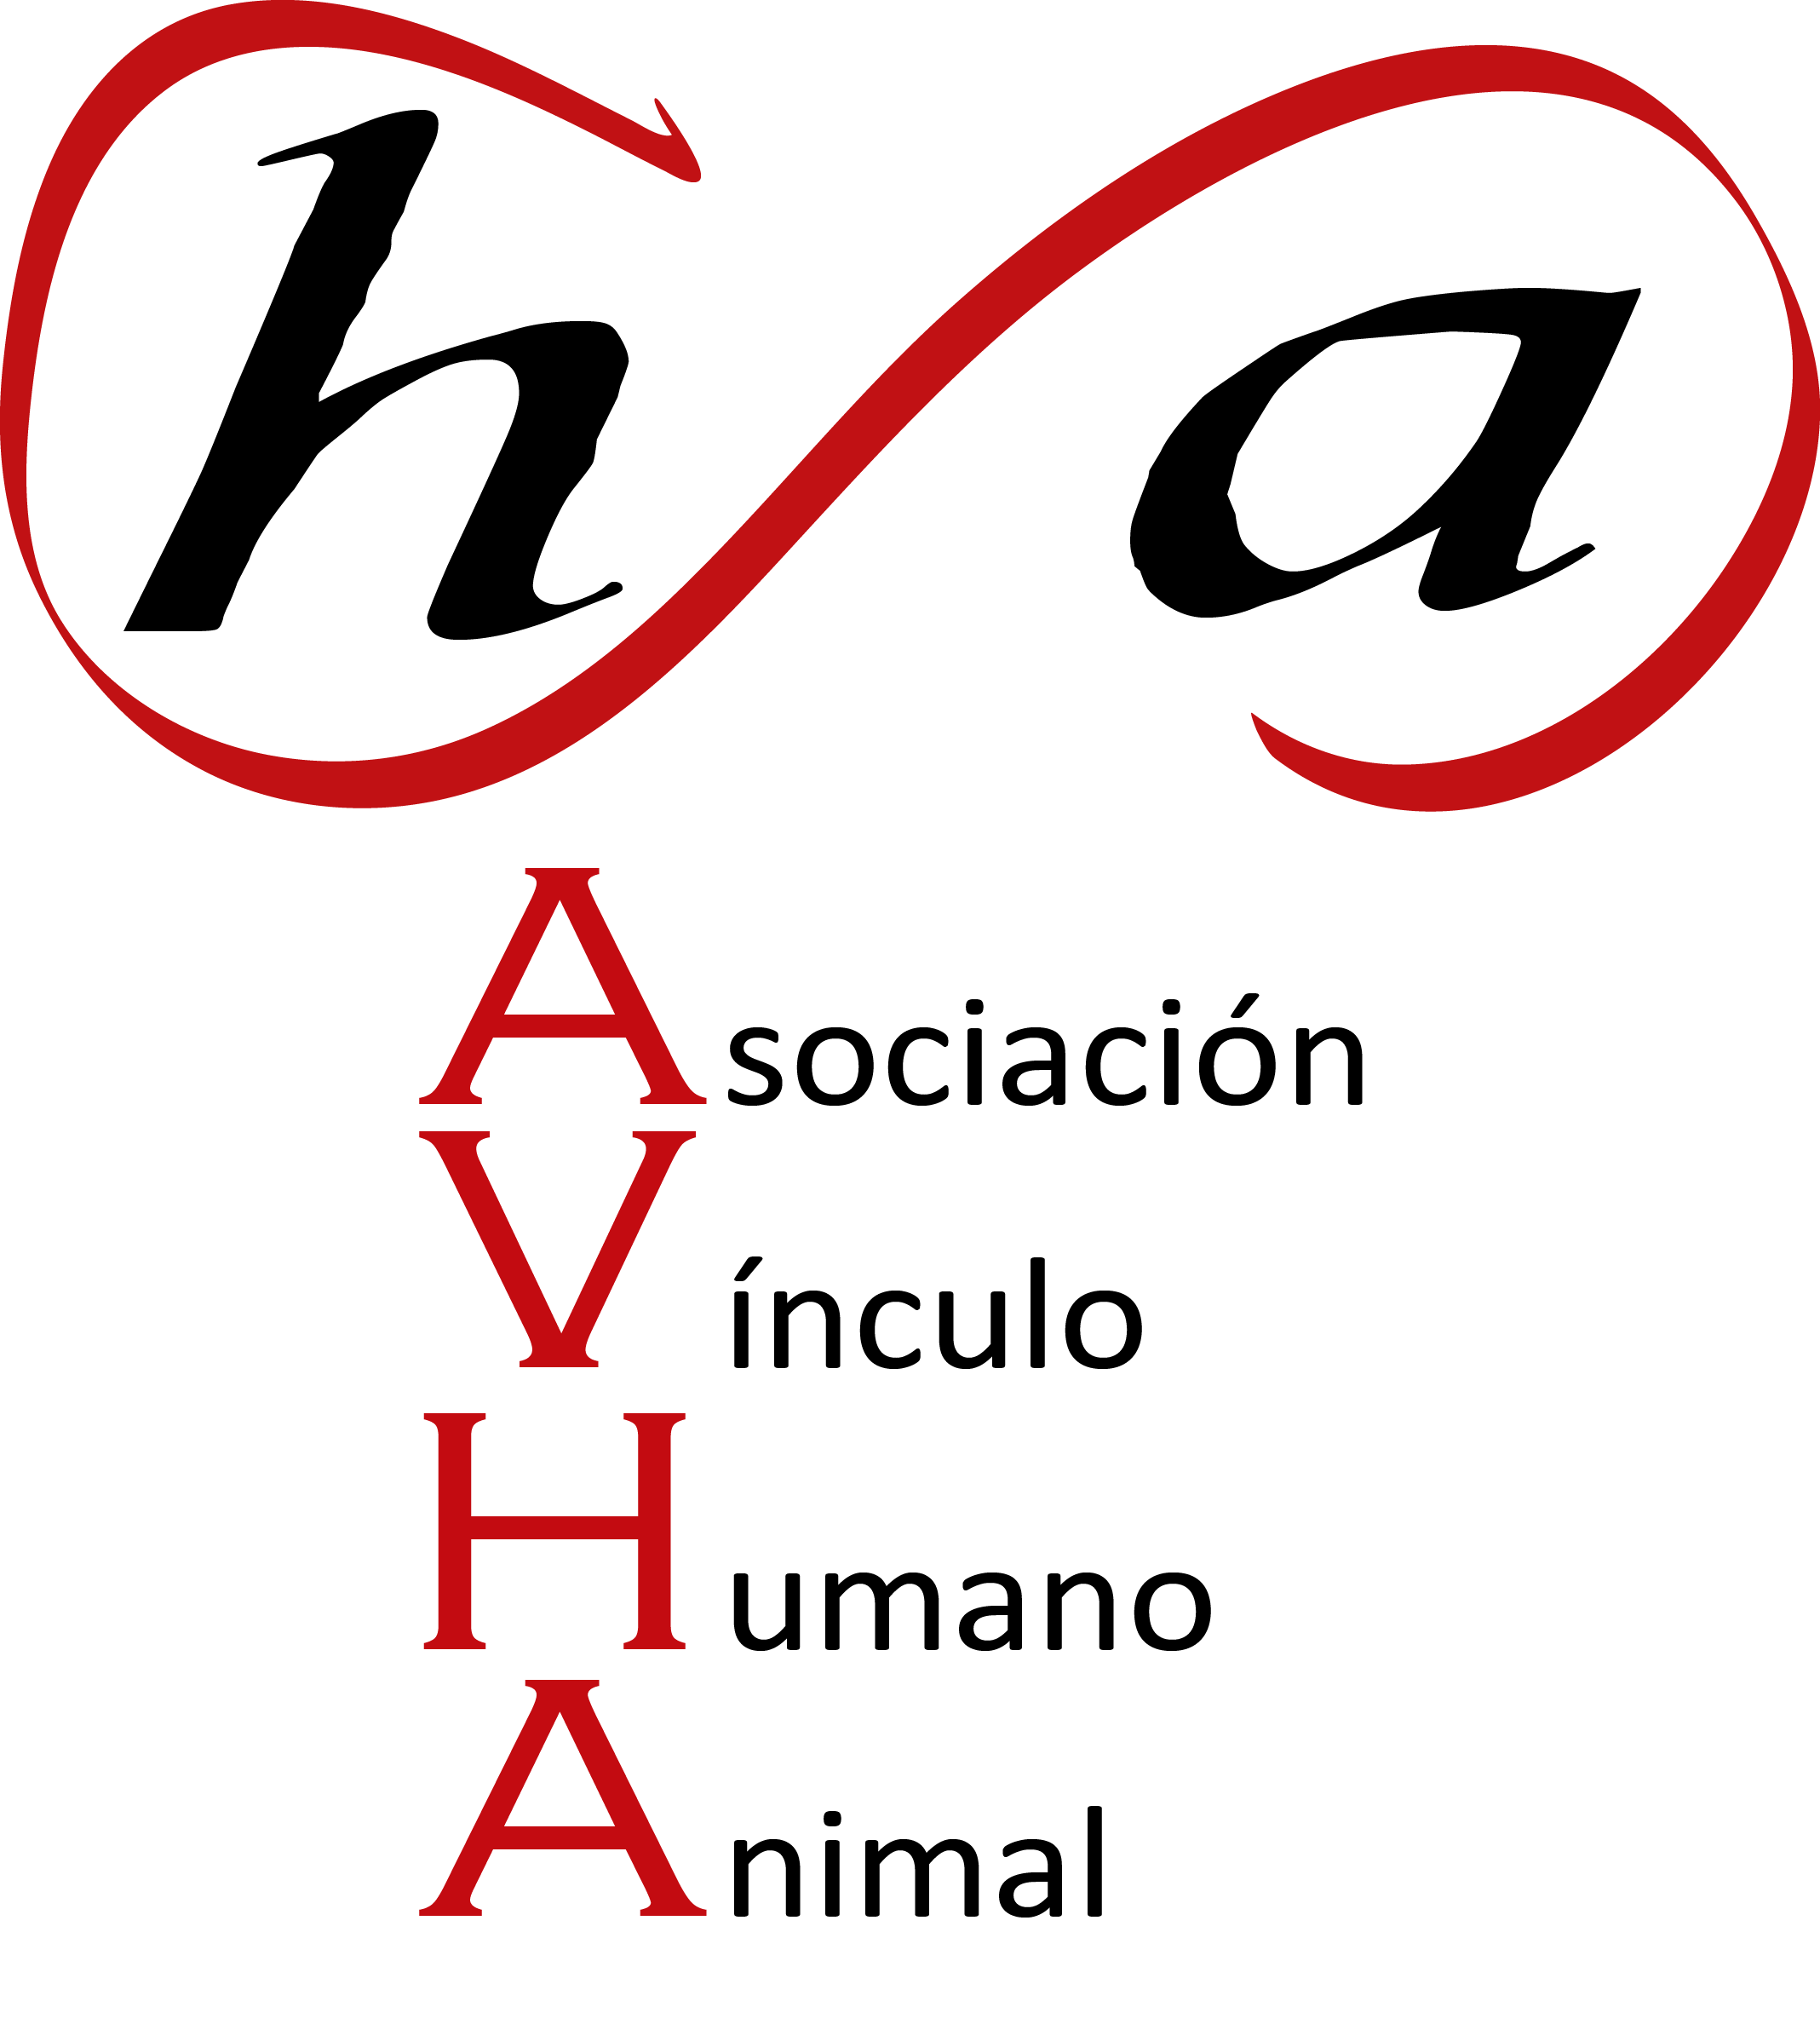 LogoAVHA(2)_G (fondo blanco) Mejorado